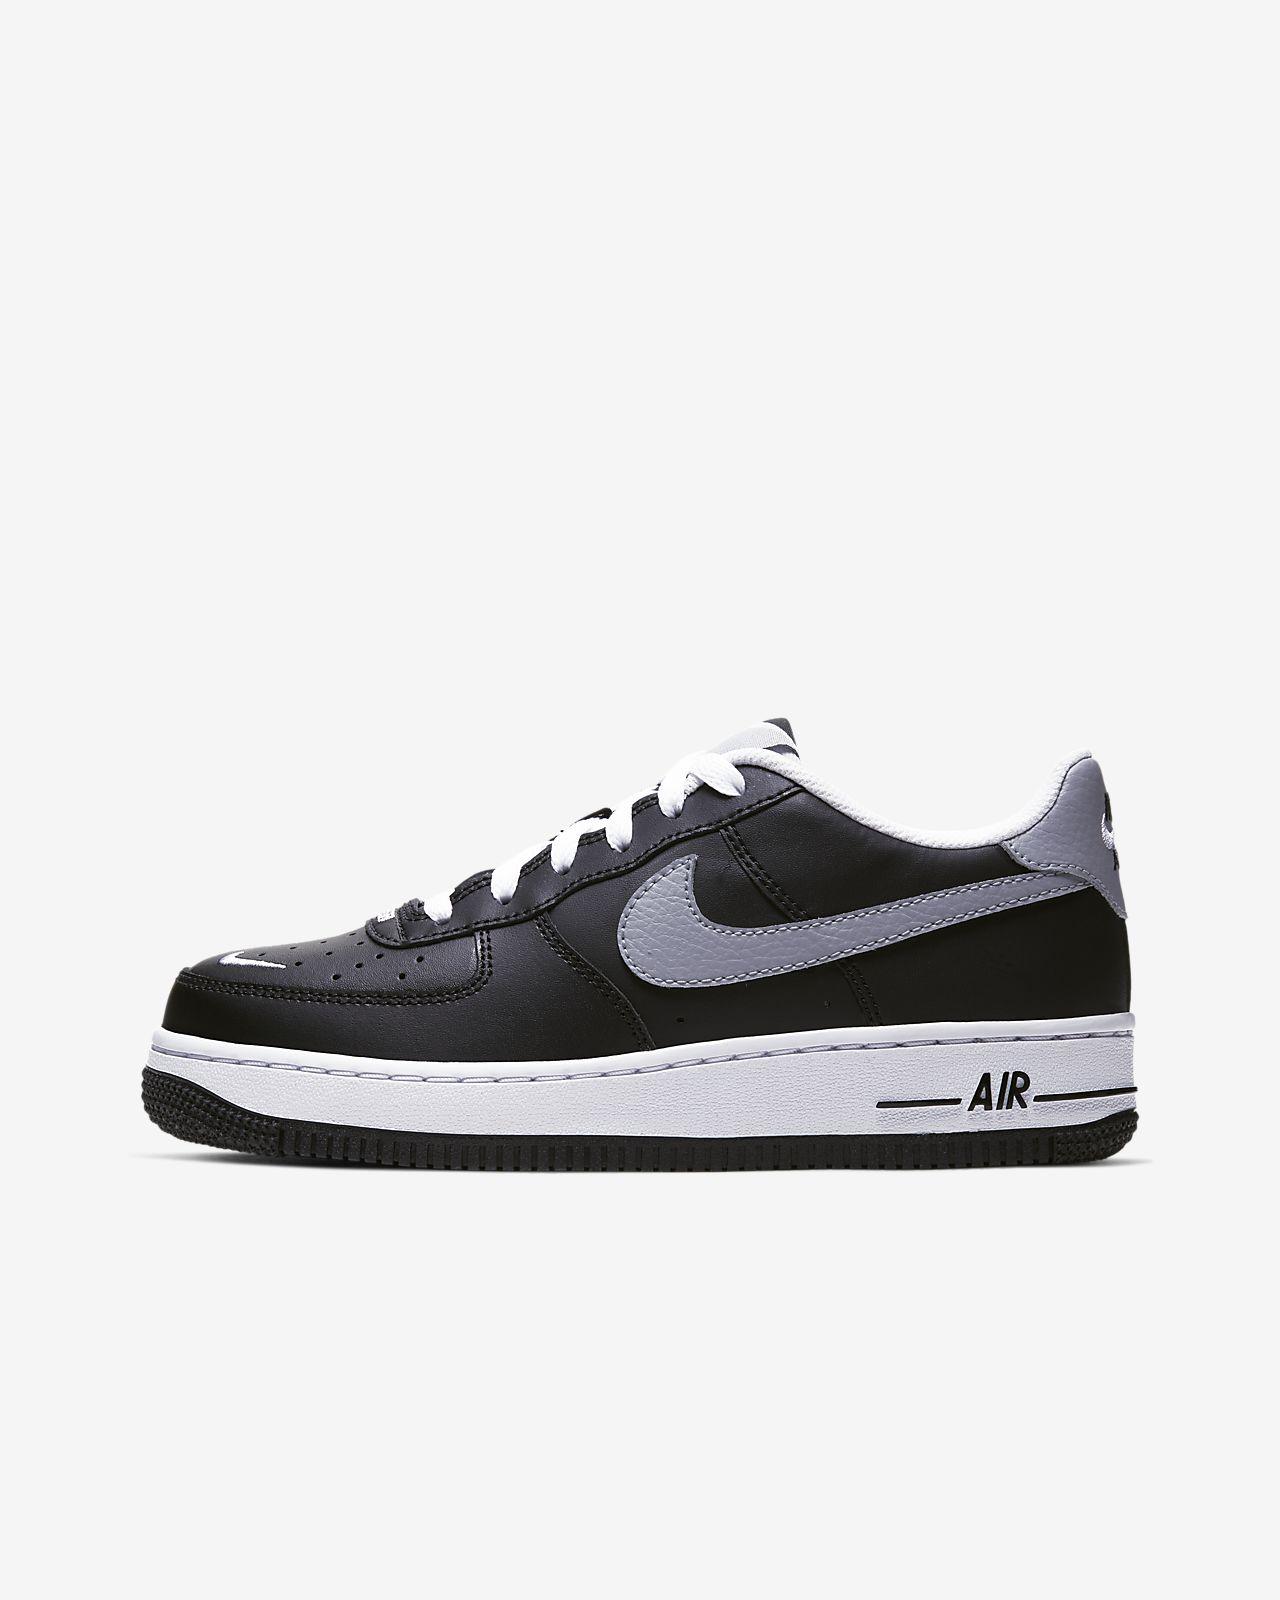 JUNIOR NIKE AIR FORCE 1 LV8 2 SHOES NIKE Juniors Shoes